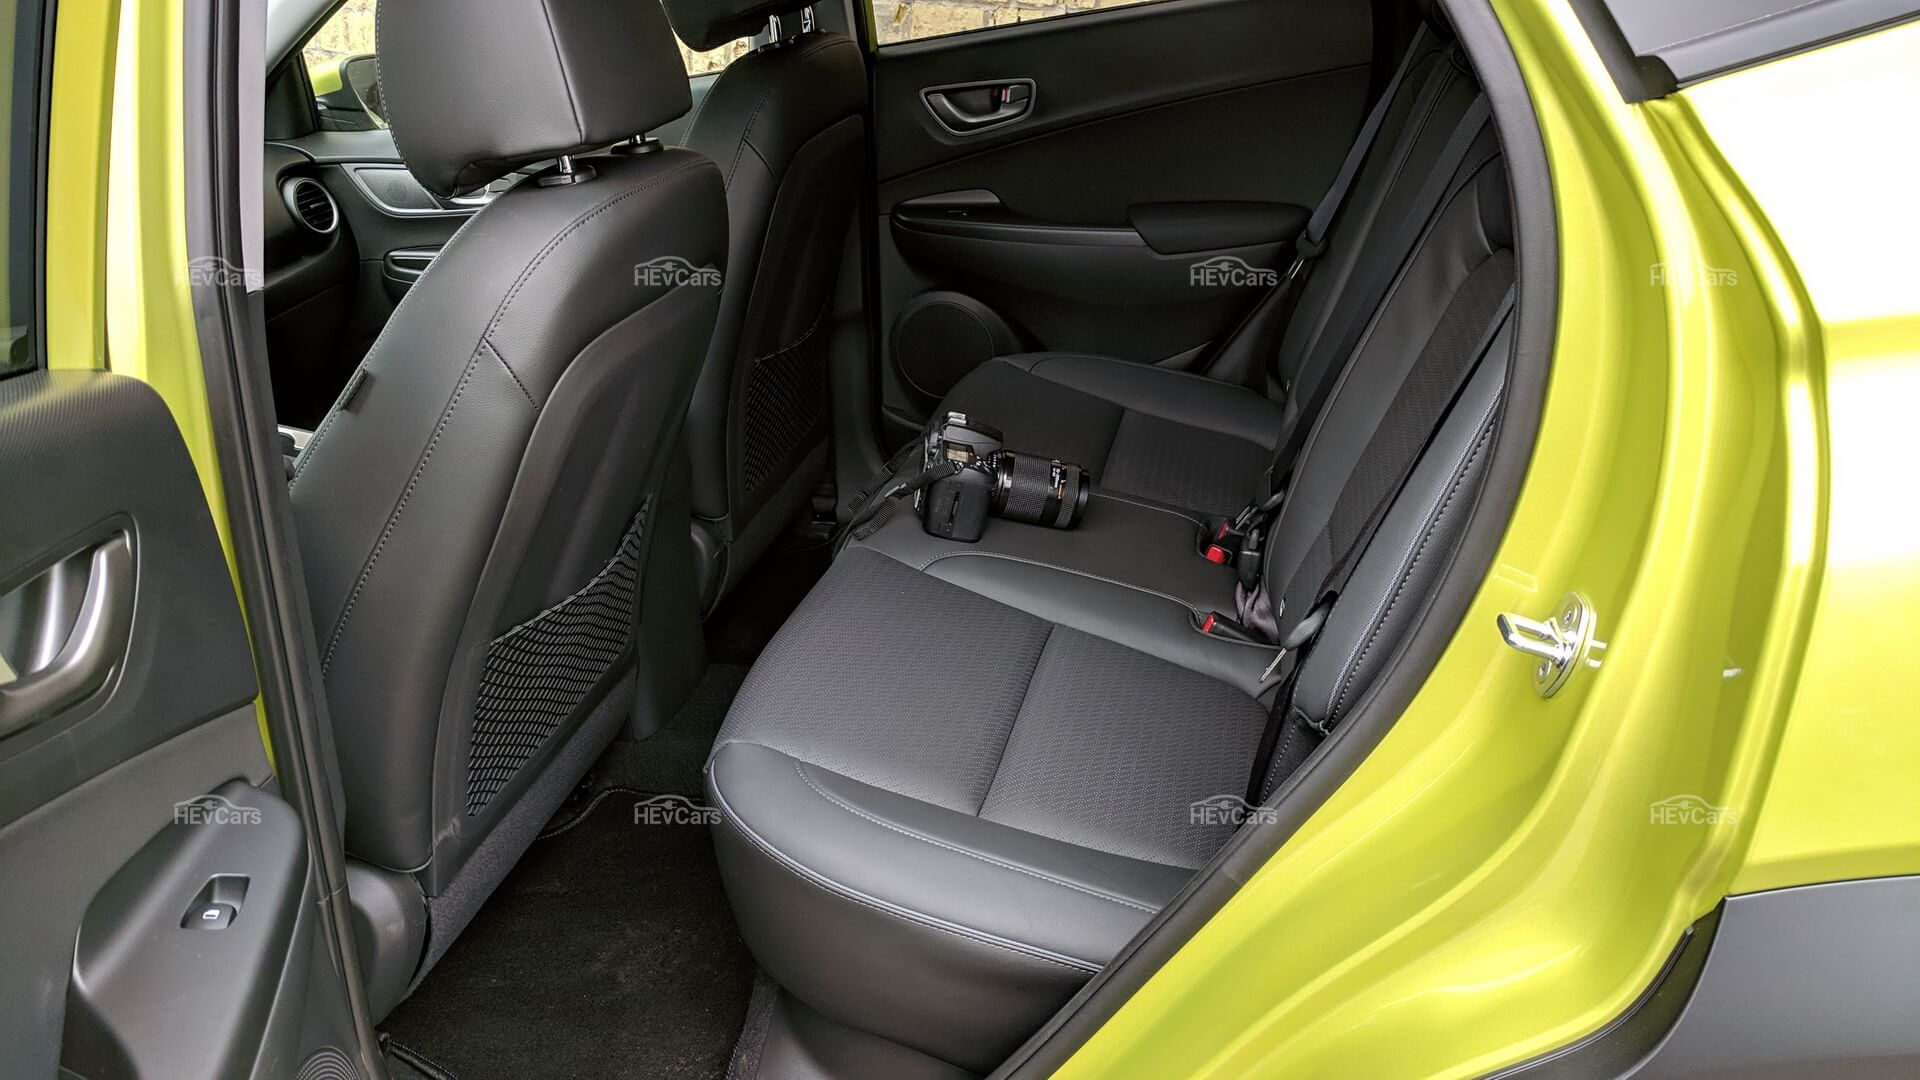 Задний ряд сидений в Hyundai Kona Electric